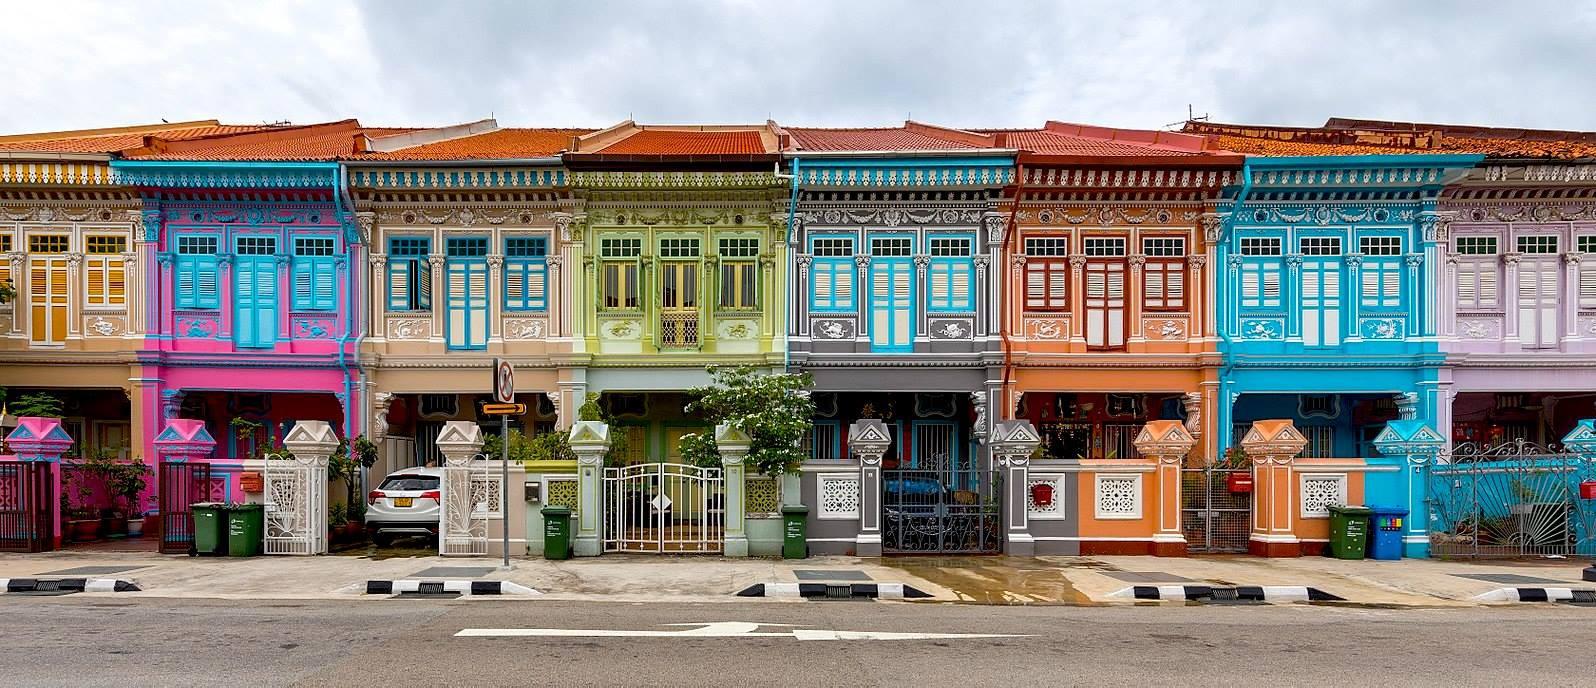 Joo Chiat, bairro de Singapura.